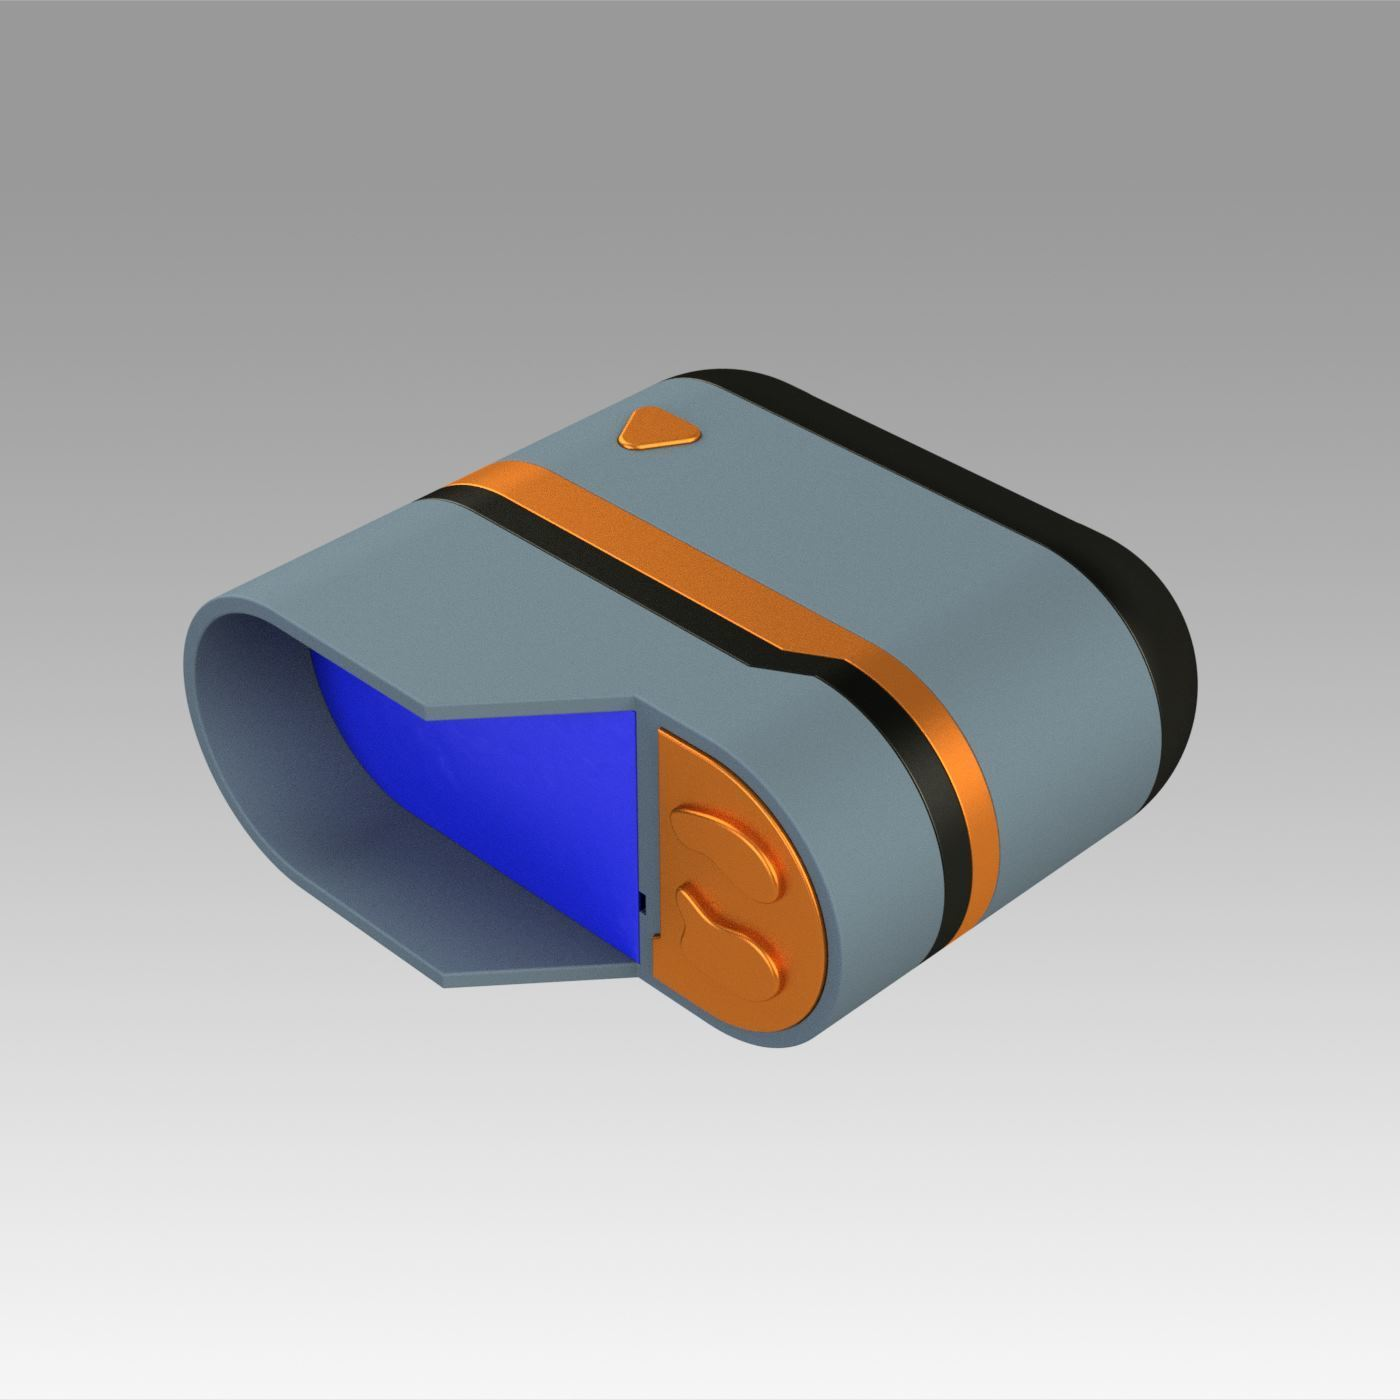 2.jpg Download OBJ file Star Trek Prop Dr Phlox Scanner replica prop cosplay • 3D printer object, Blackeveryday